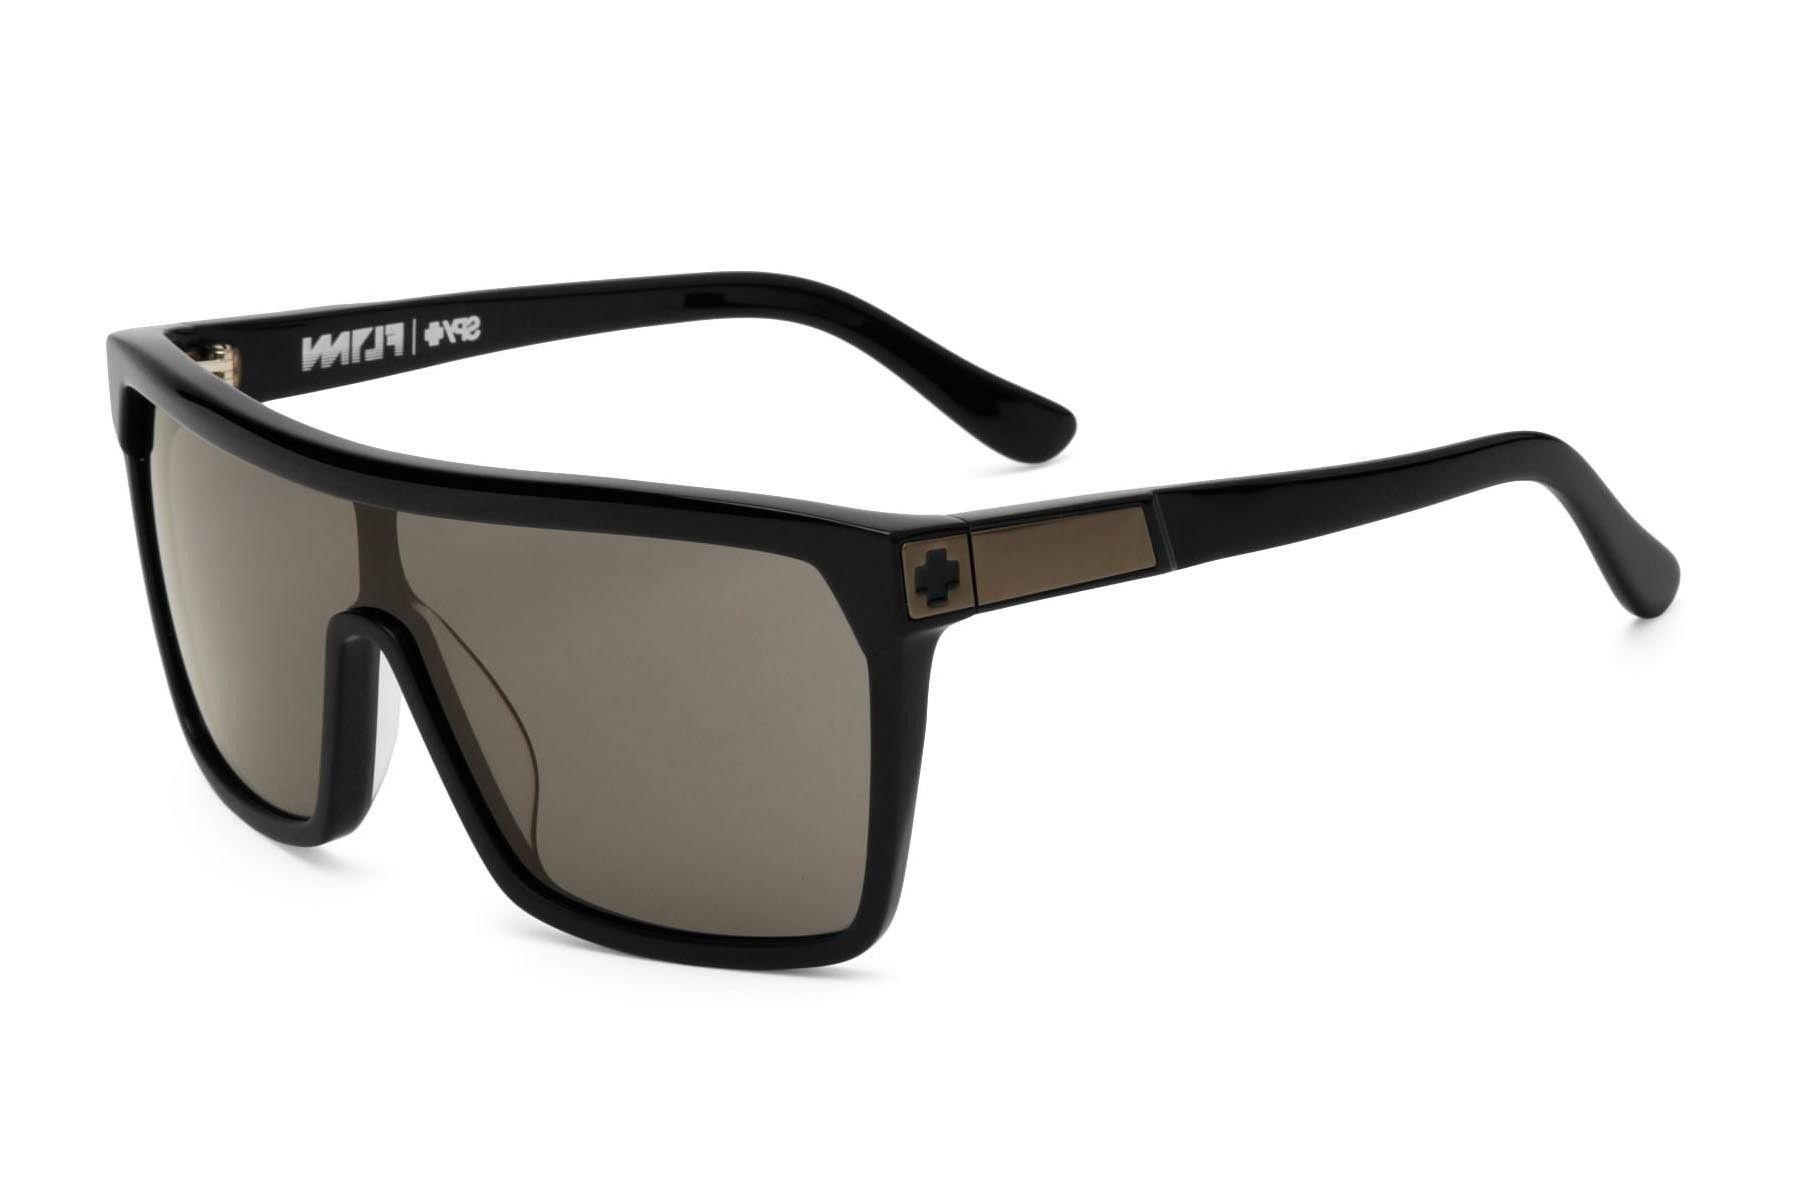 bf90e4029db2 Discover ideas about Spy. Spy Flynn Matte Black W Shiny Black Temples  Sunglasses